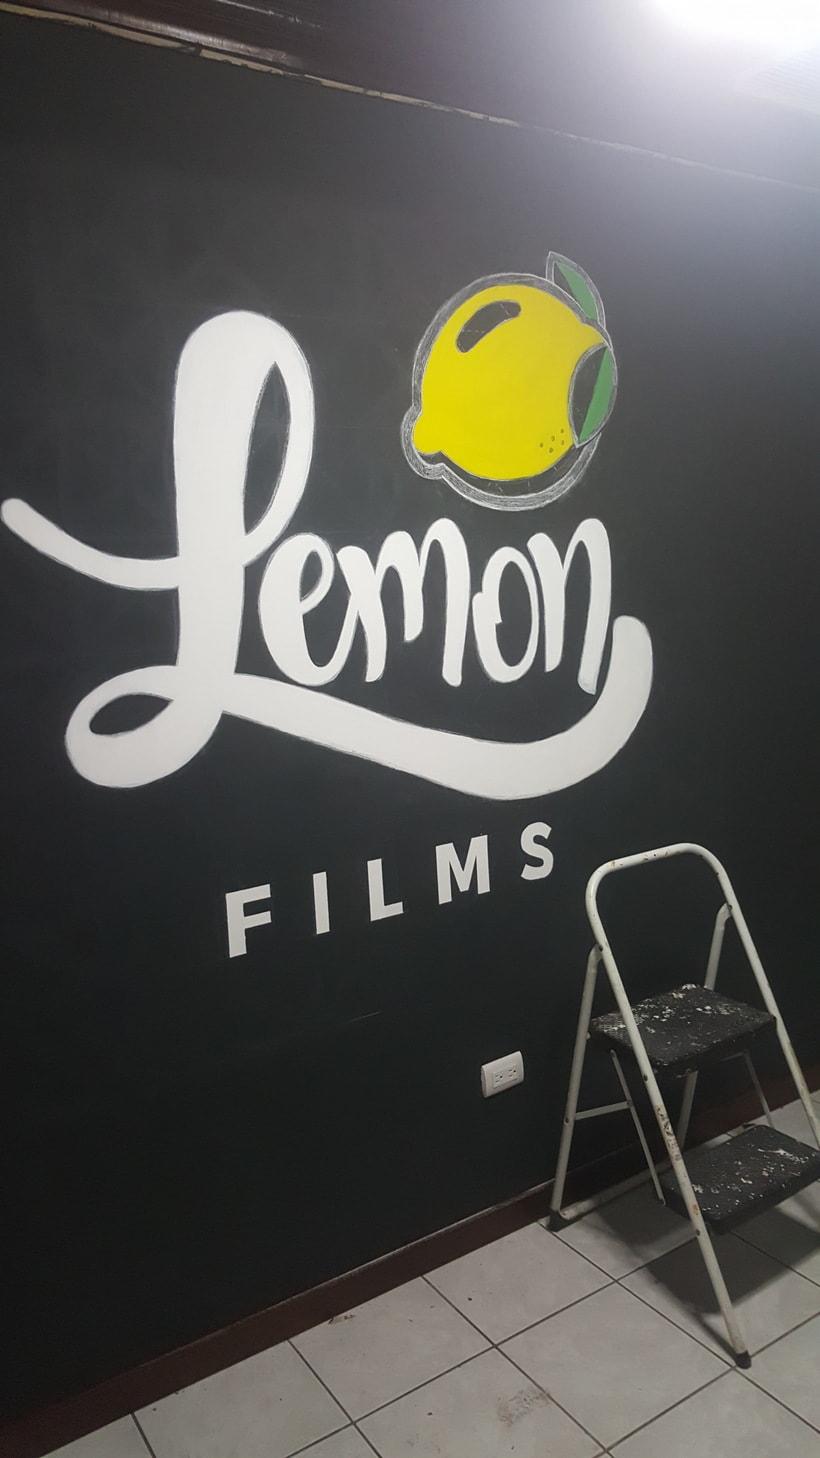 Lettering de gran formato/ Proyecto personal (Lemon Films) 12